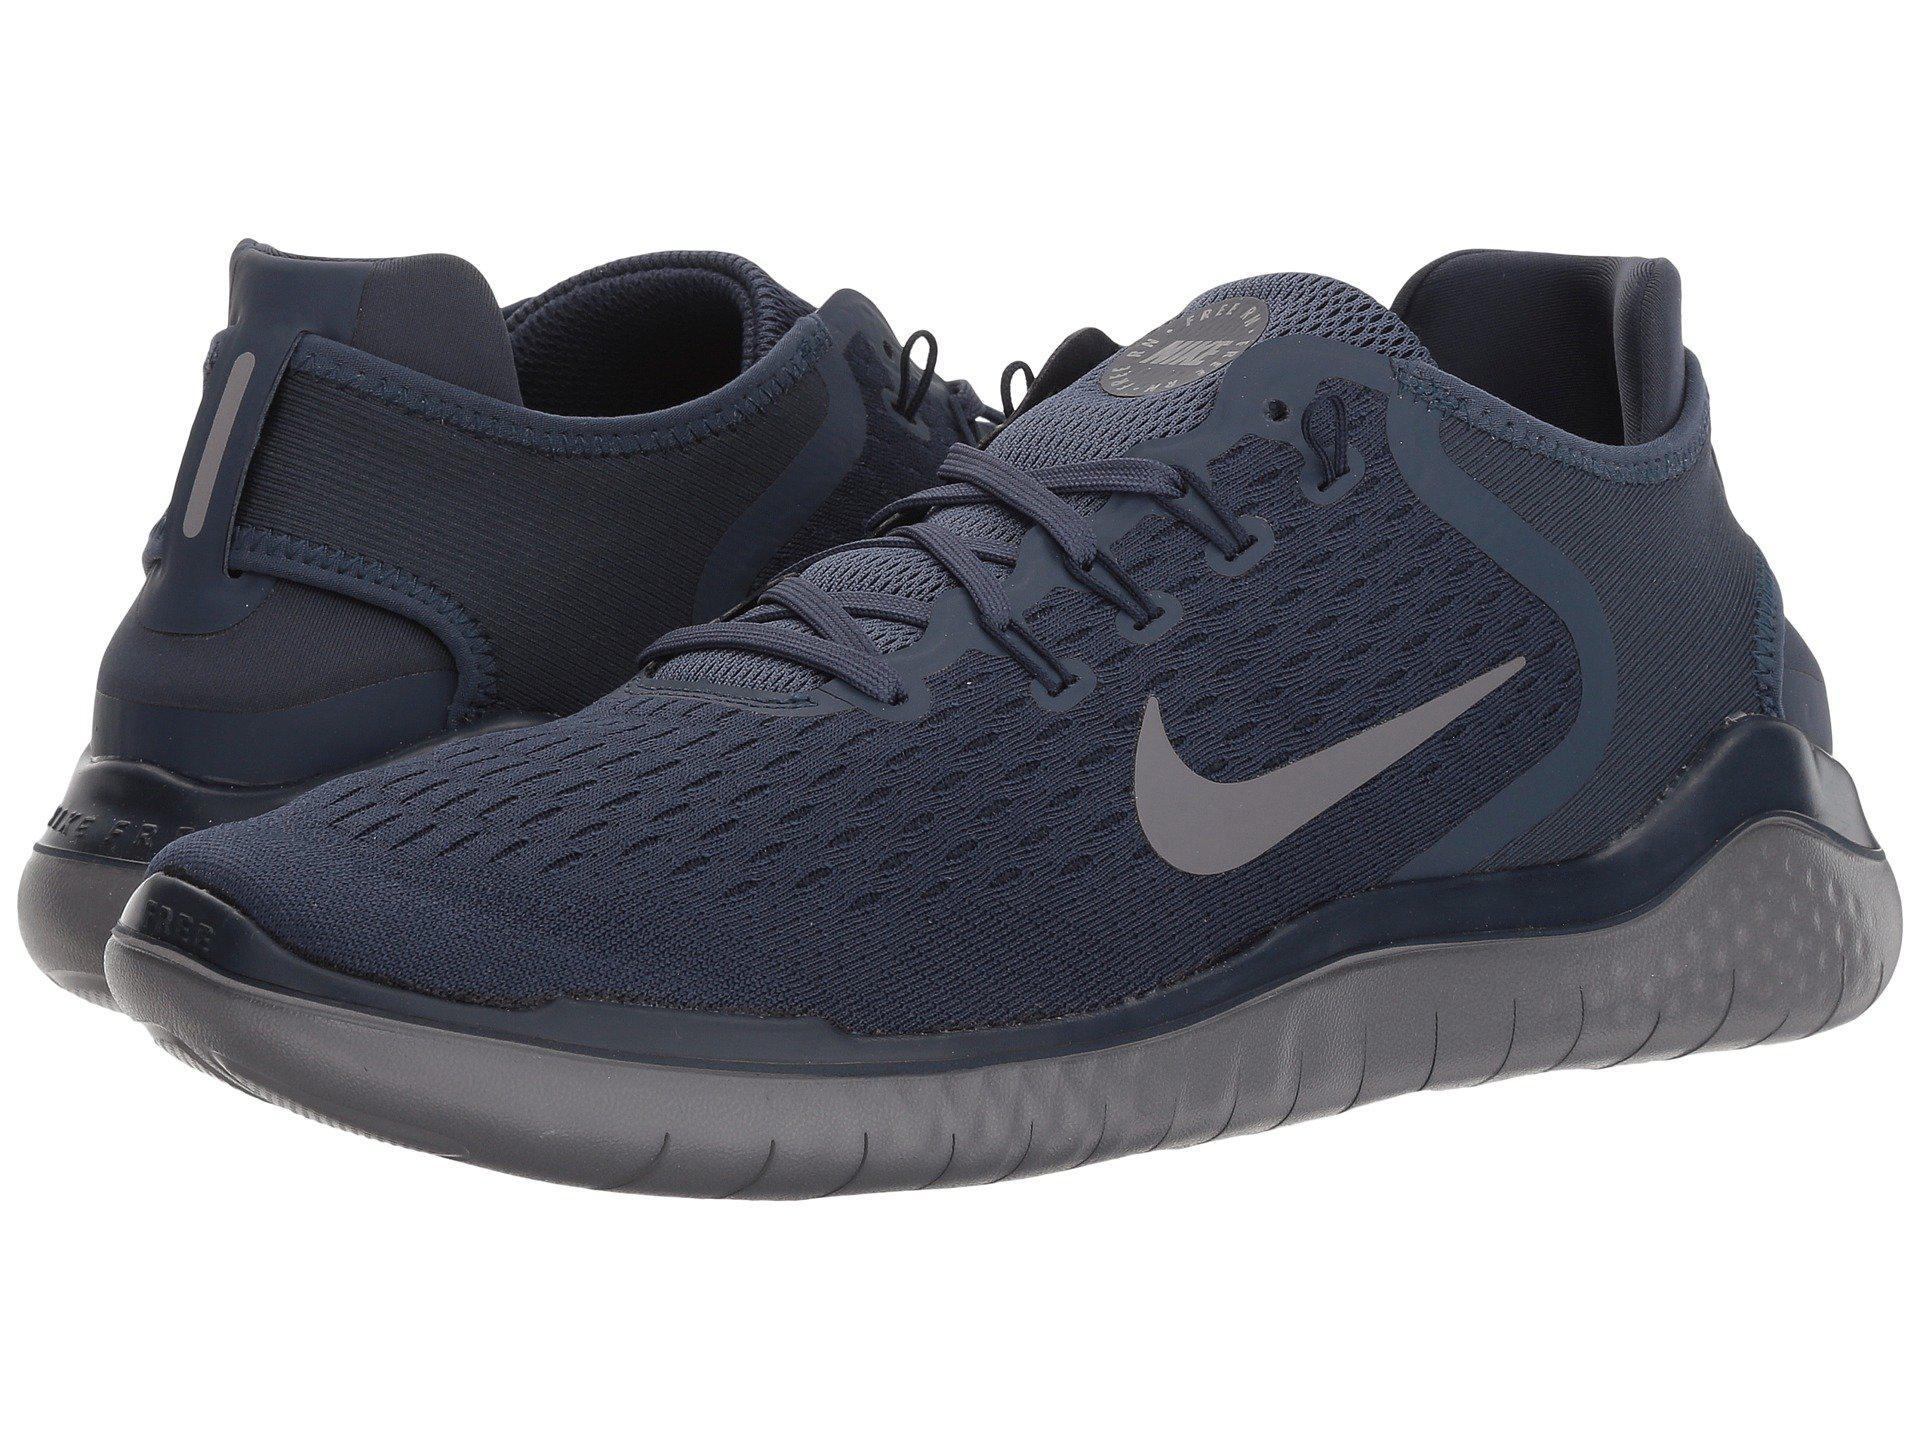 ff86c6543dbf9 ... czech lyst nike free rn 2018 white black mens running shoes in blue  4d788 1bb79